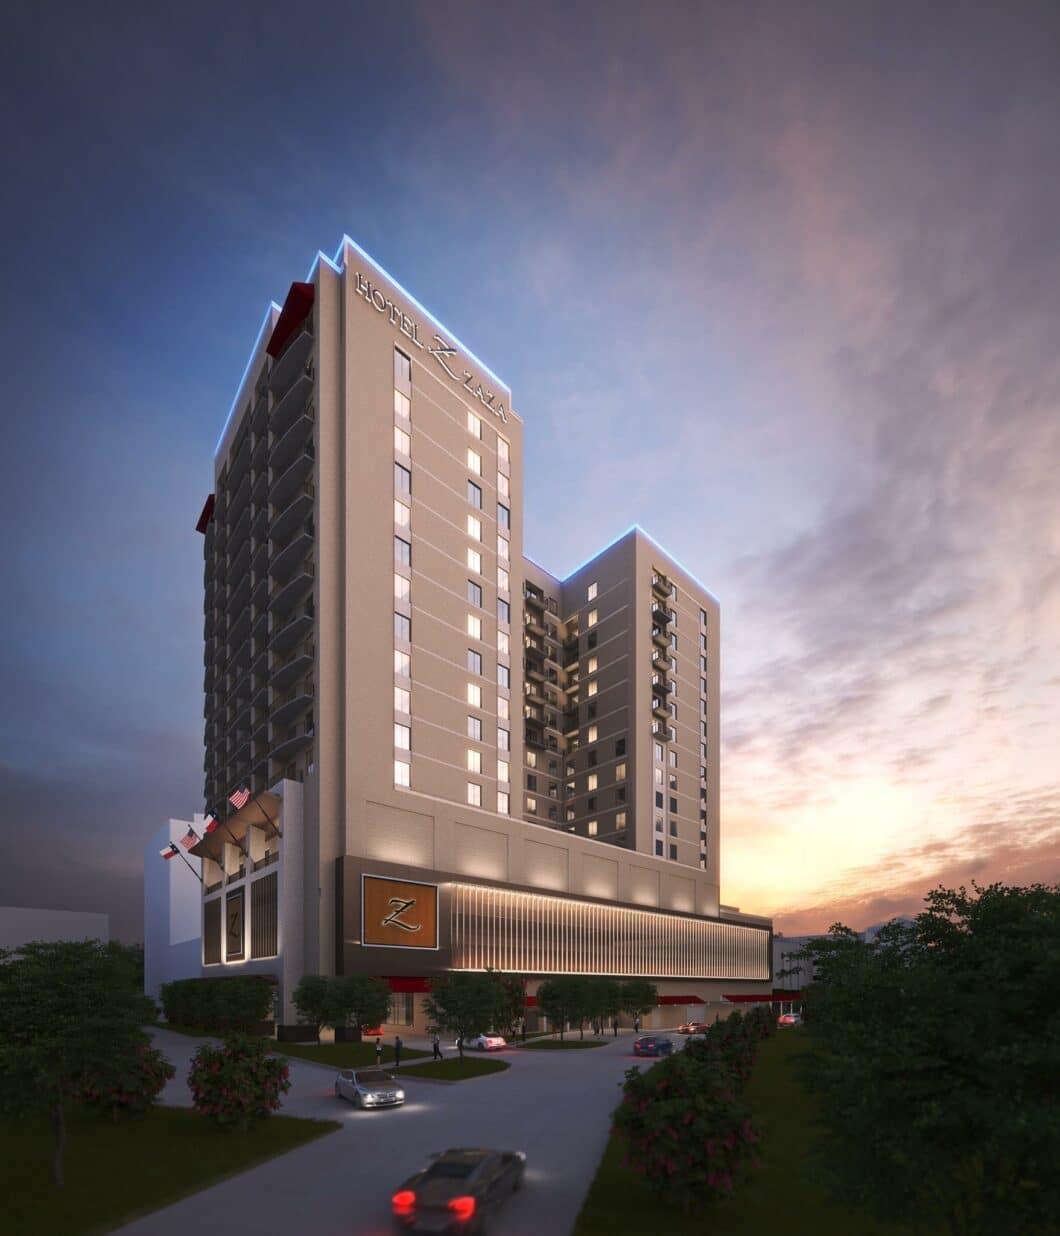 The McCarthy Apartments and Hotel ZaZa